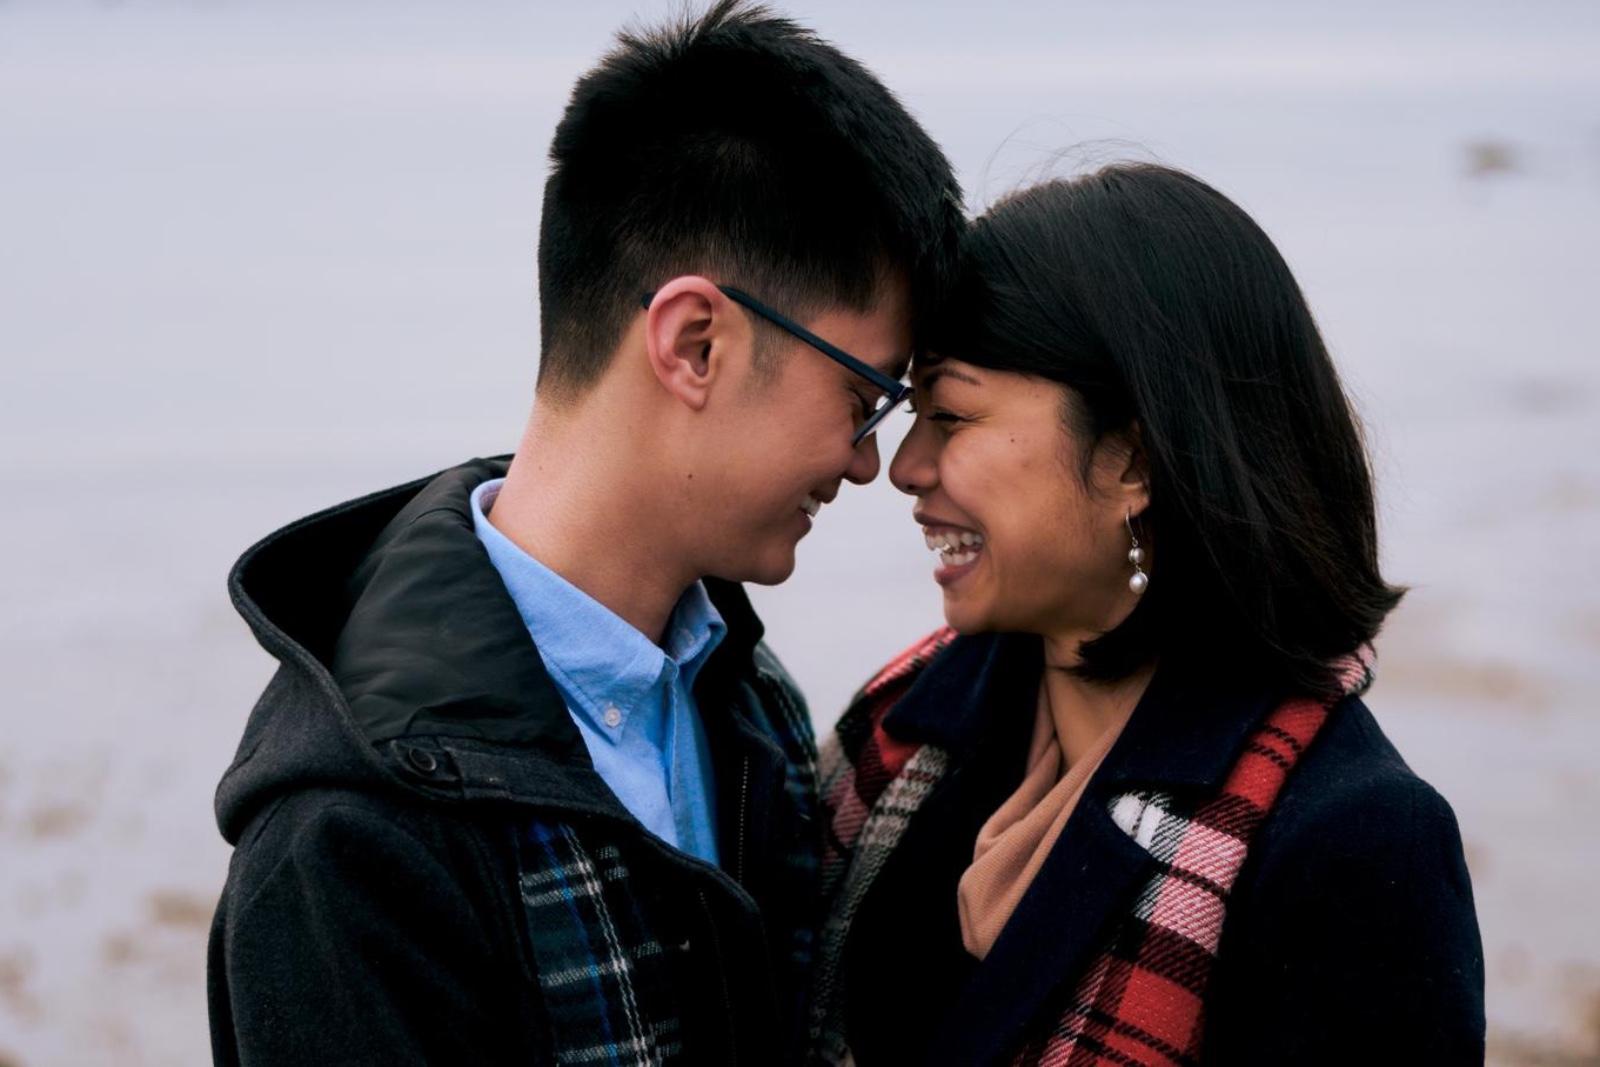 Michael Lam and Nikki Mendoza